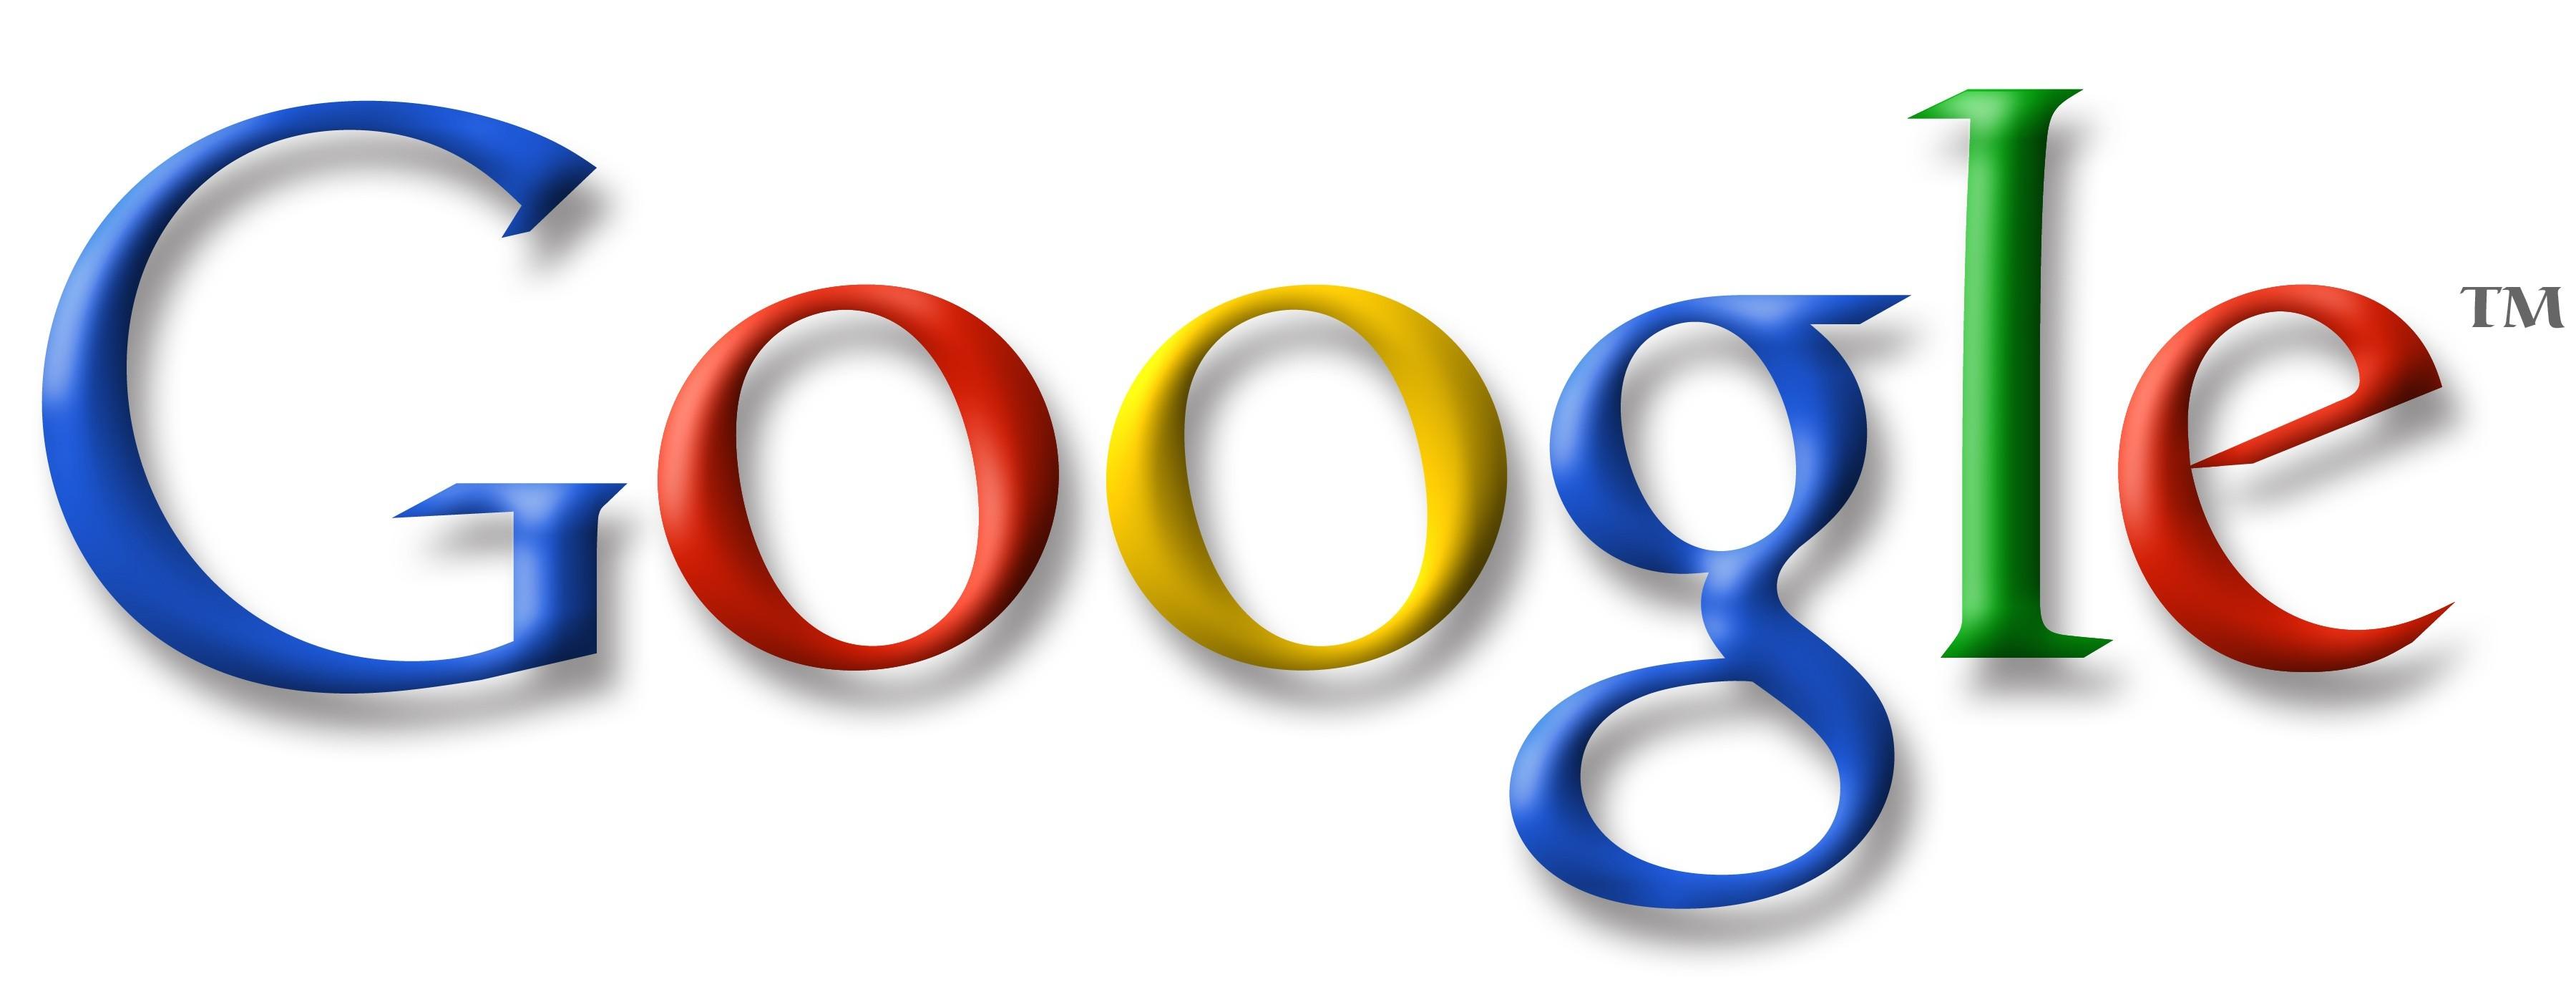 google_logo1-e1348527664627.jpg